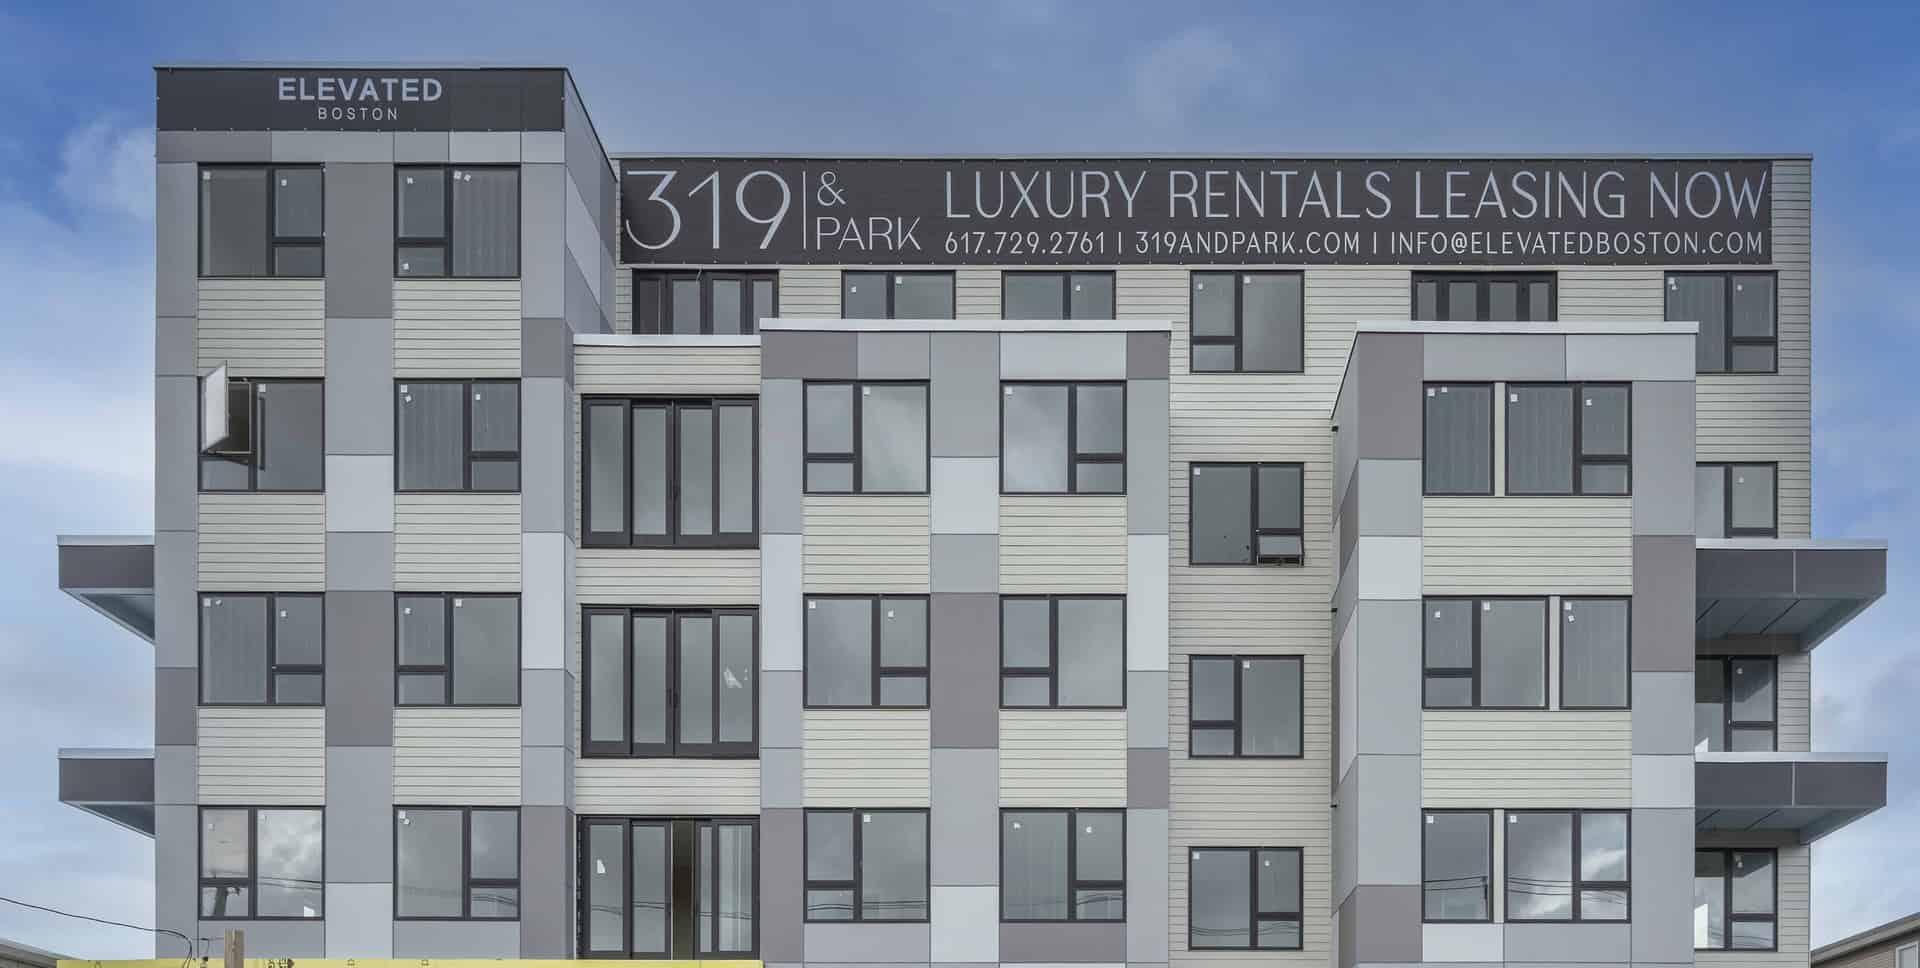 319 & Park   East Boston Luxury Rentals